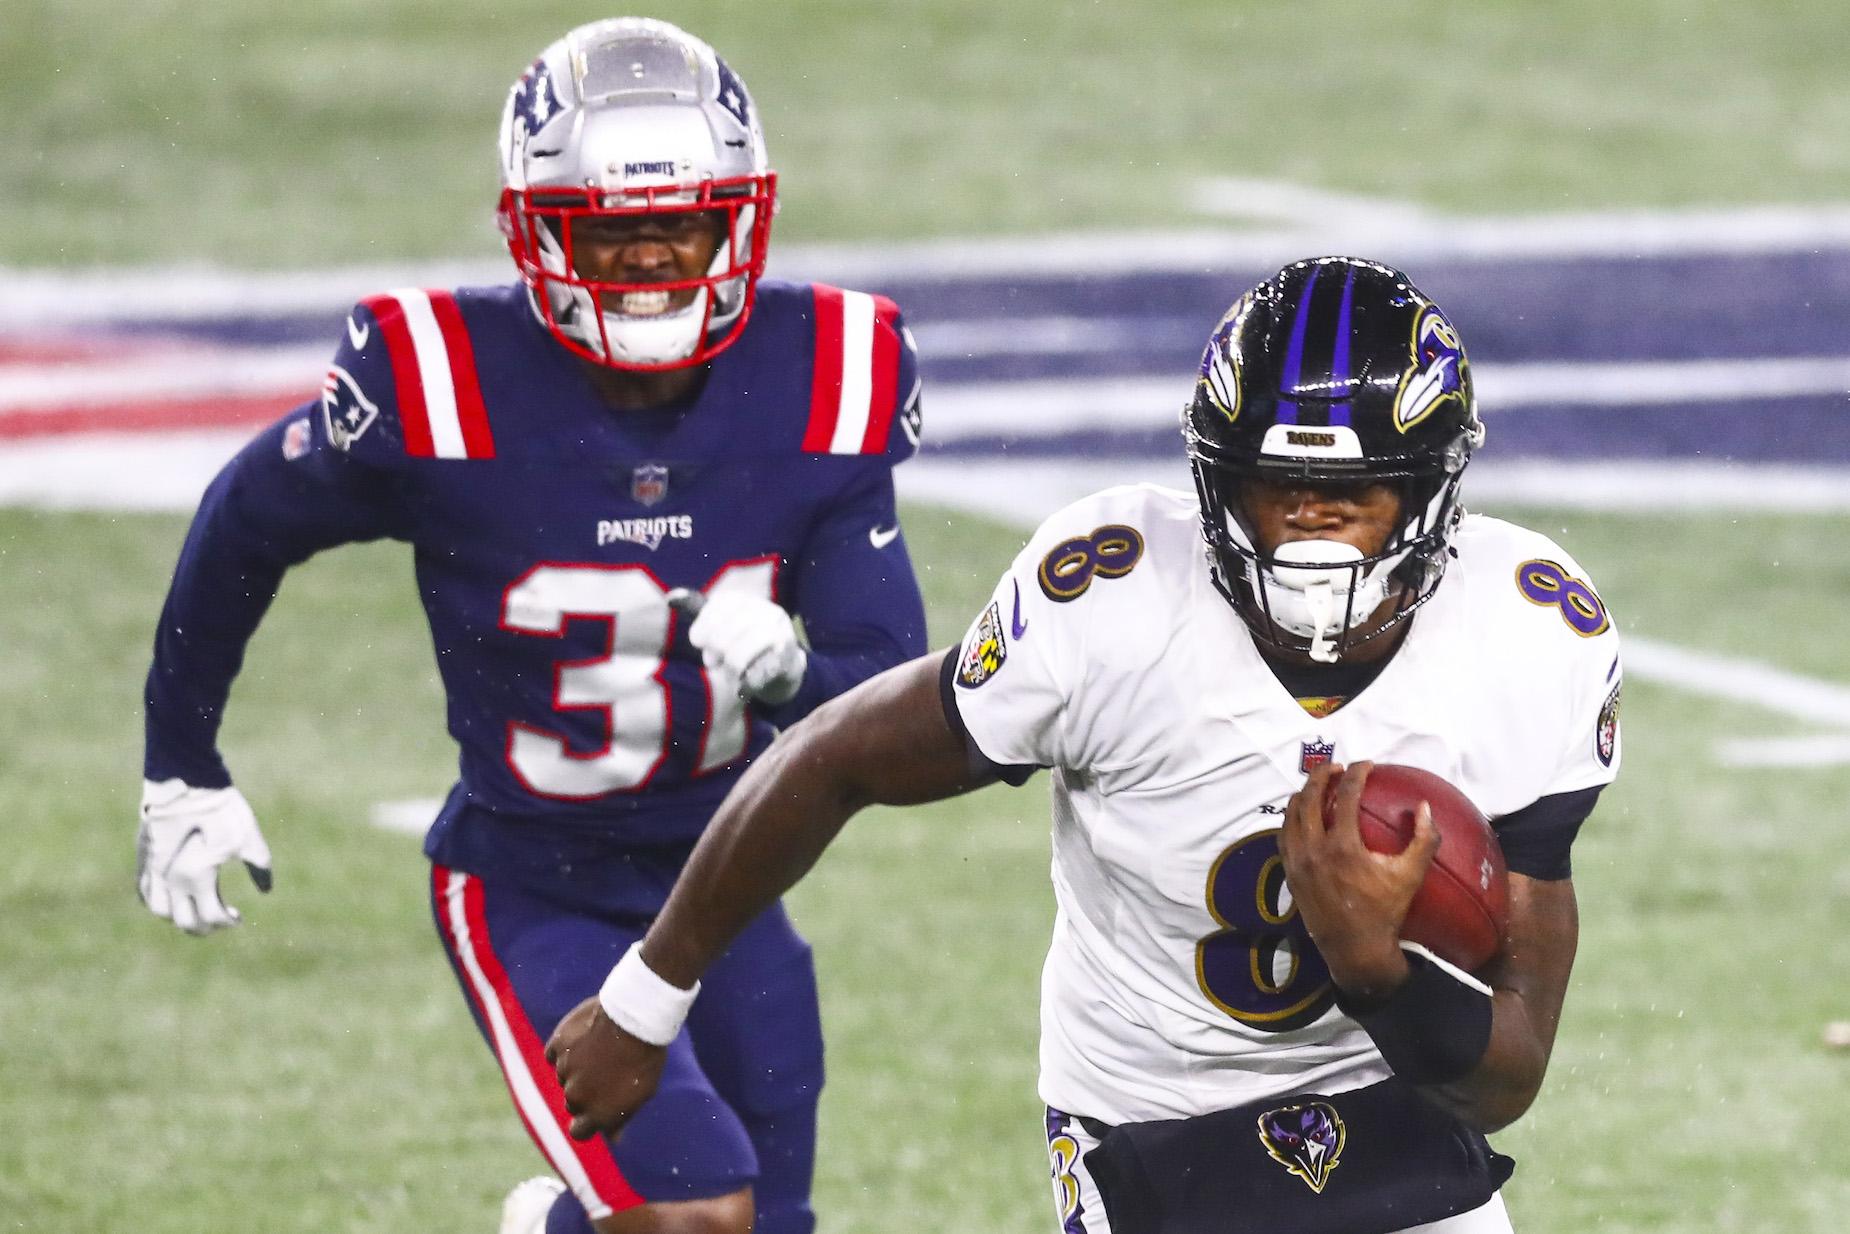 How fast is Baltimore Ravens quarterback Lamar Jackson?